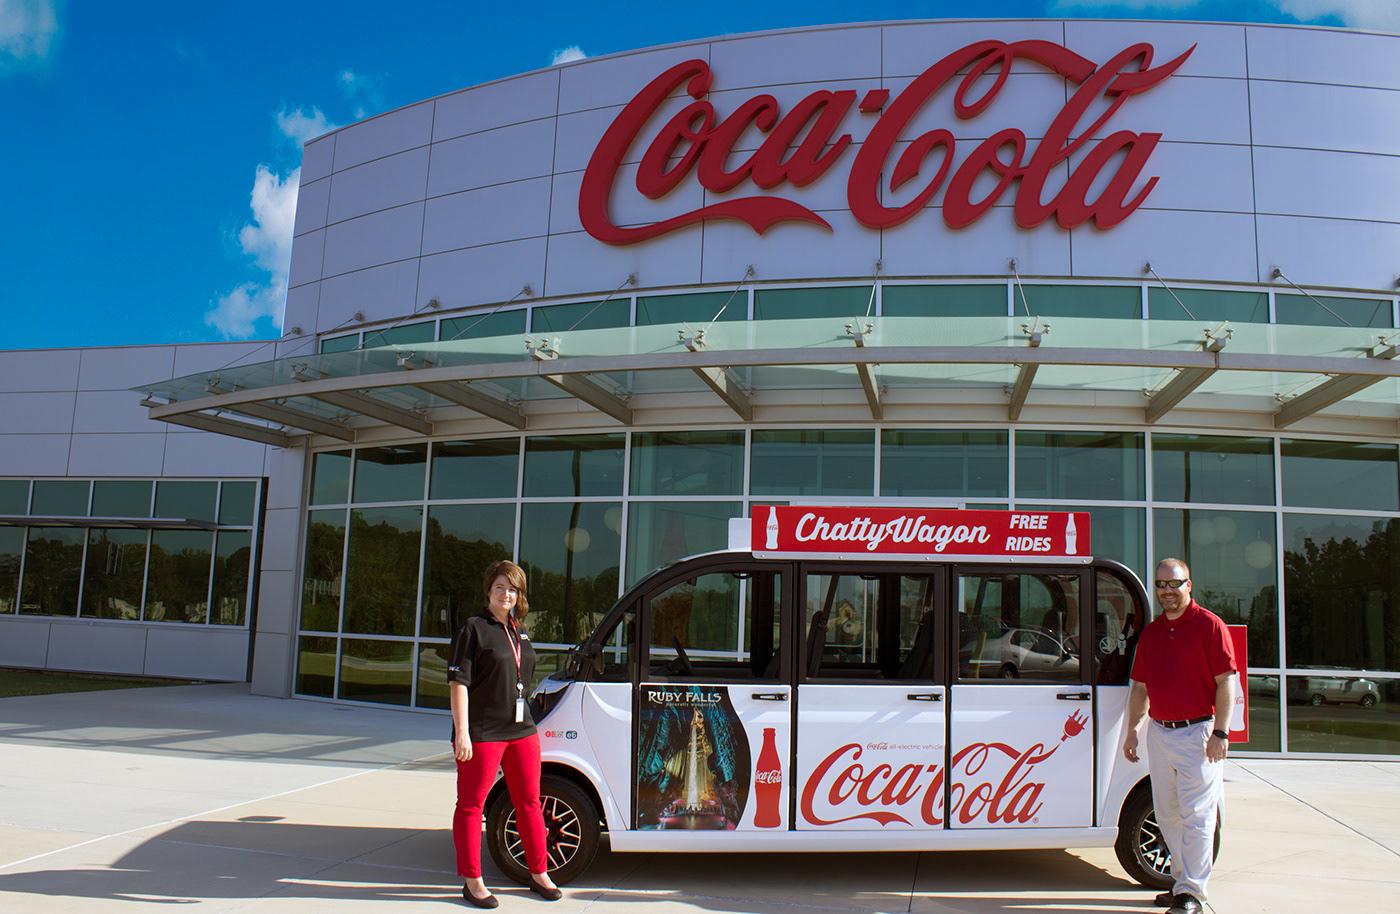 Coca-Cola chattanooga Vehicle Wrap